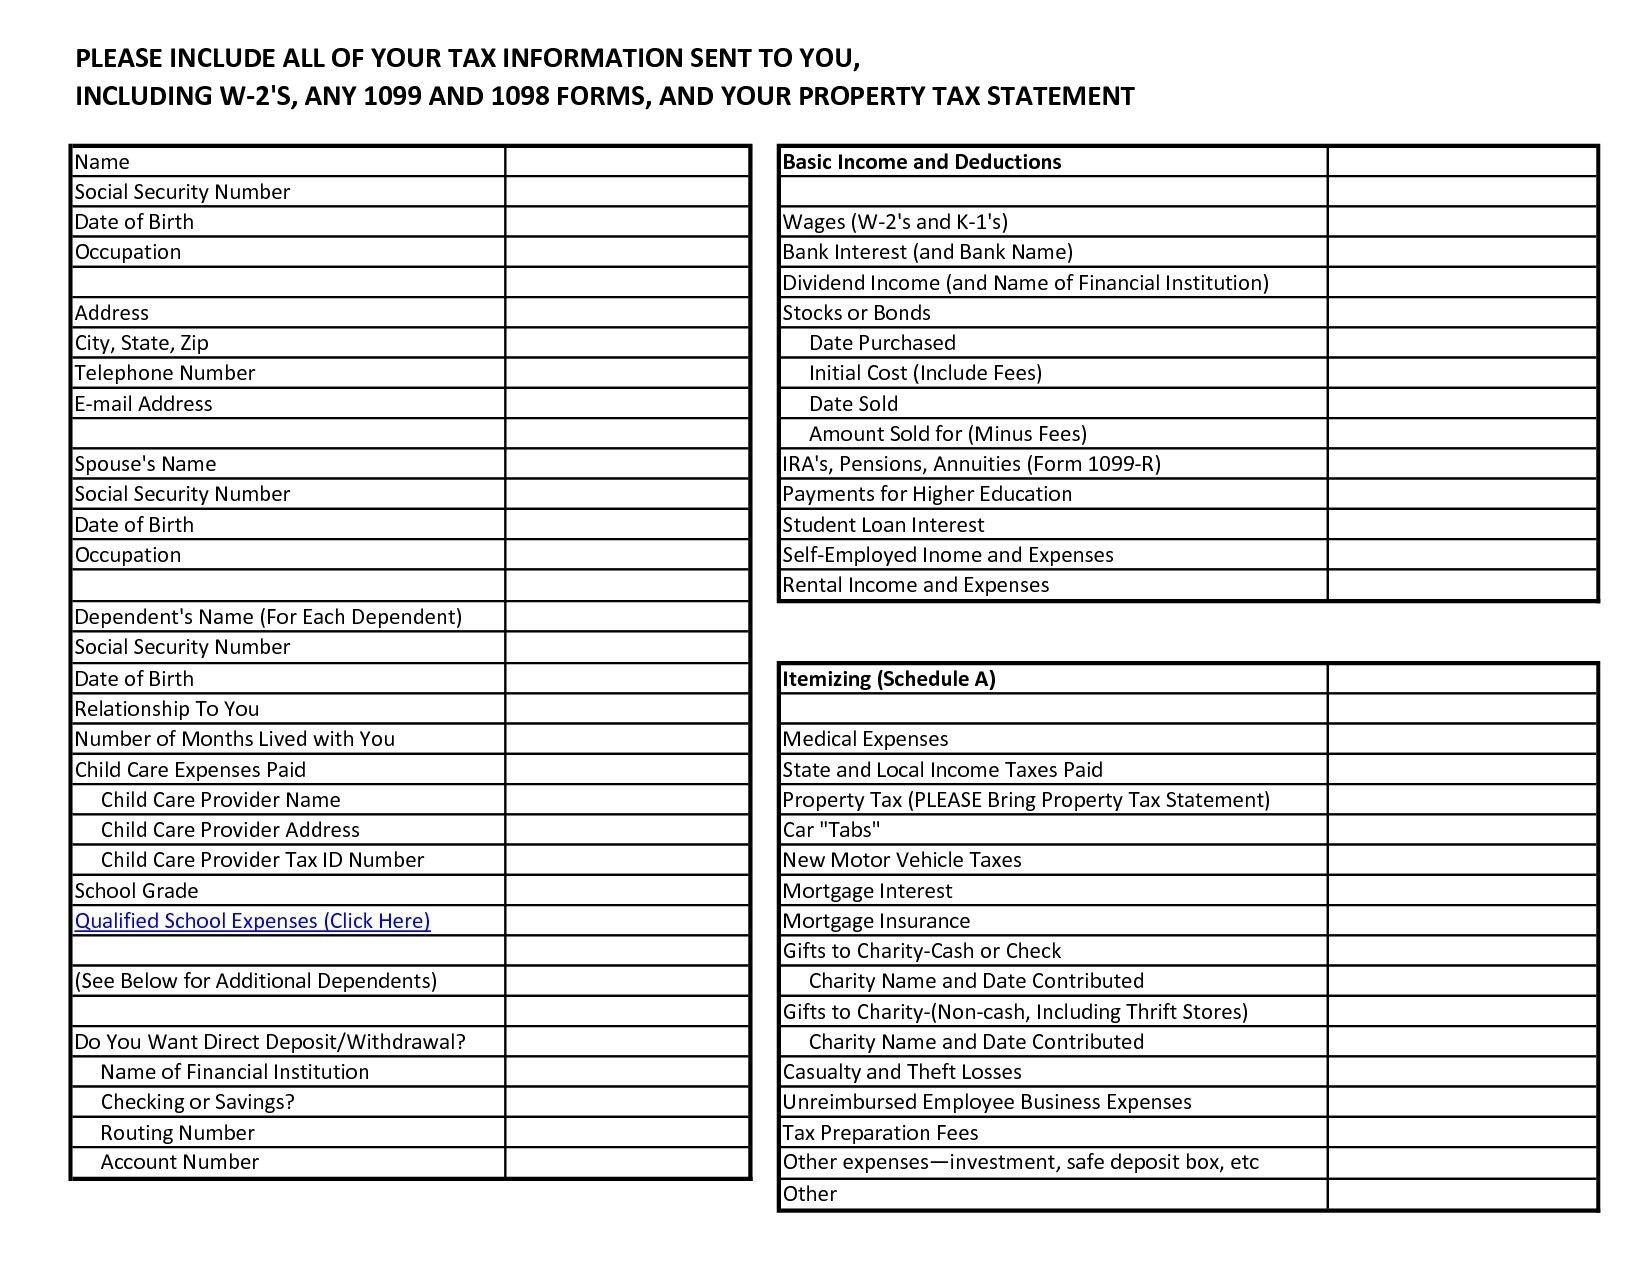 Itemized Deductions Worksheet